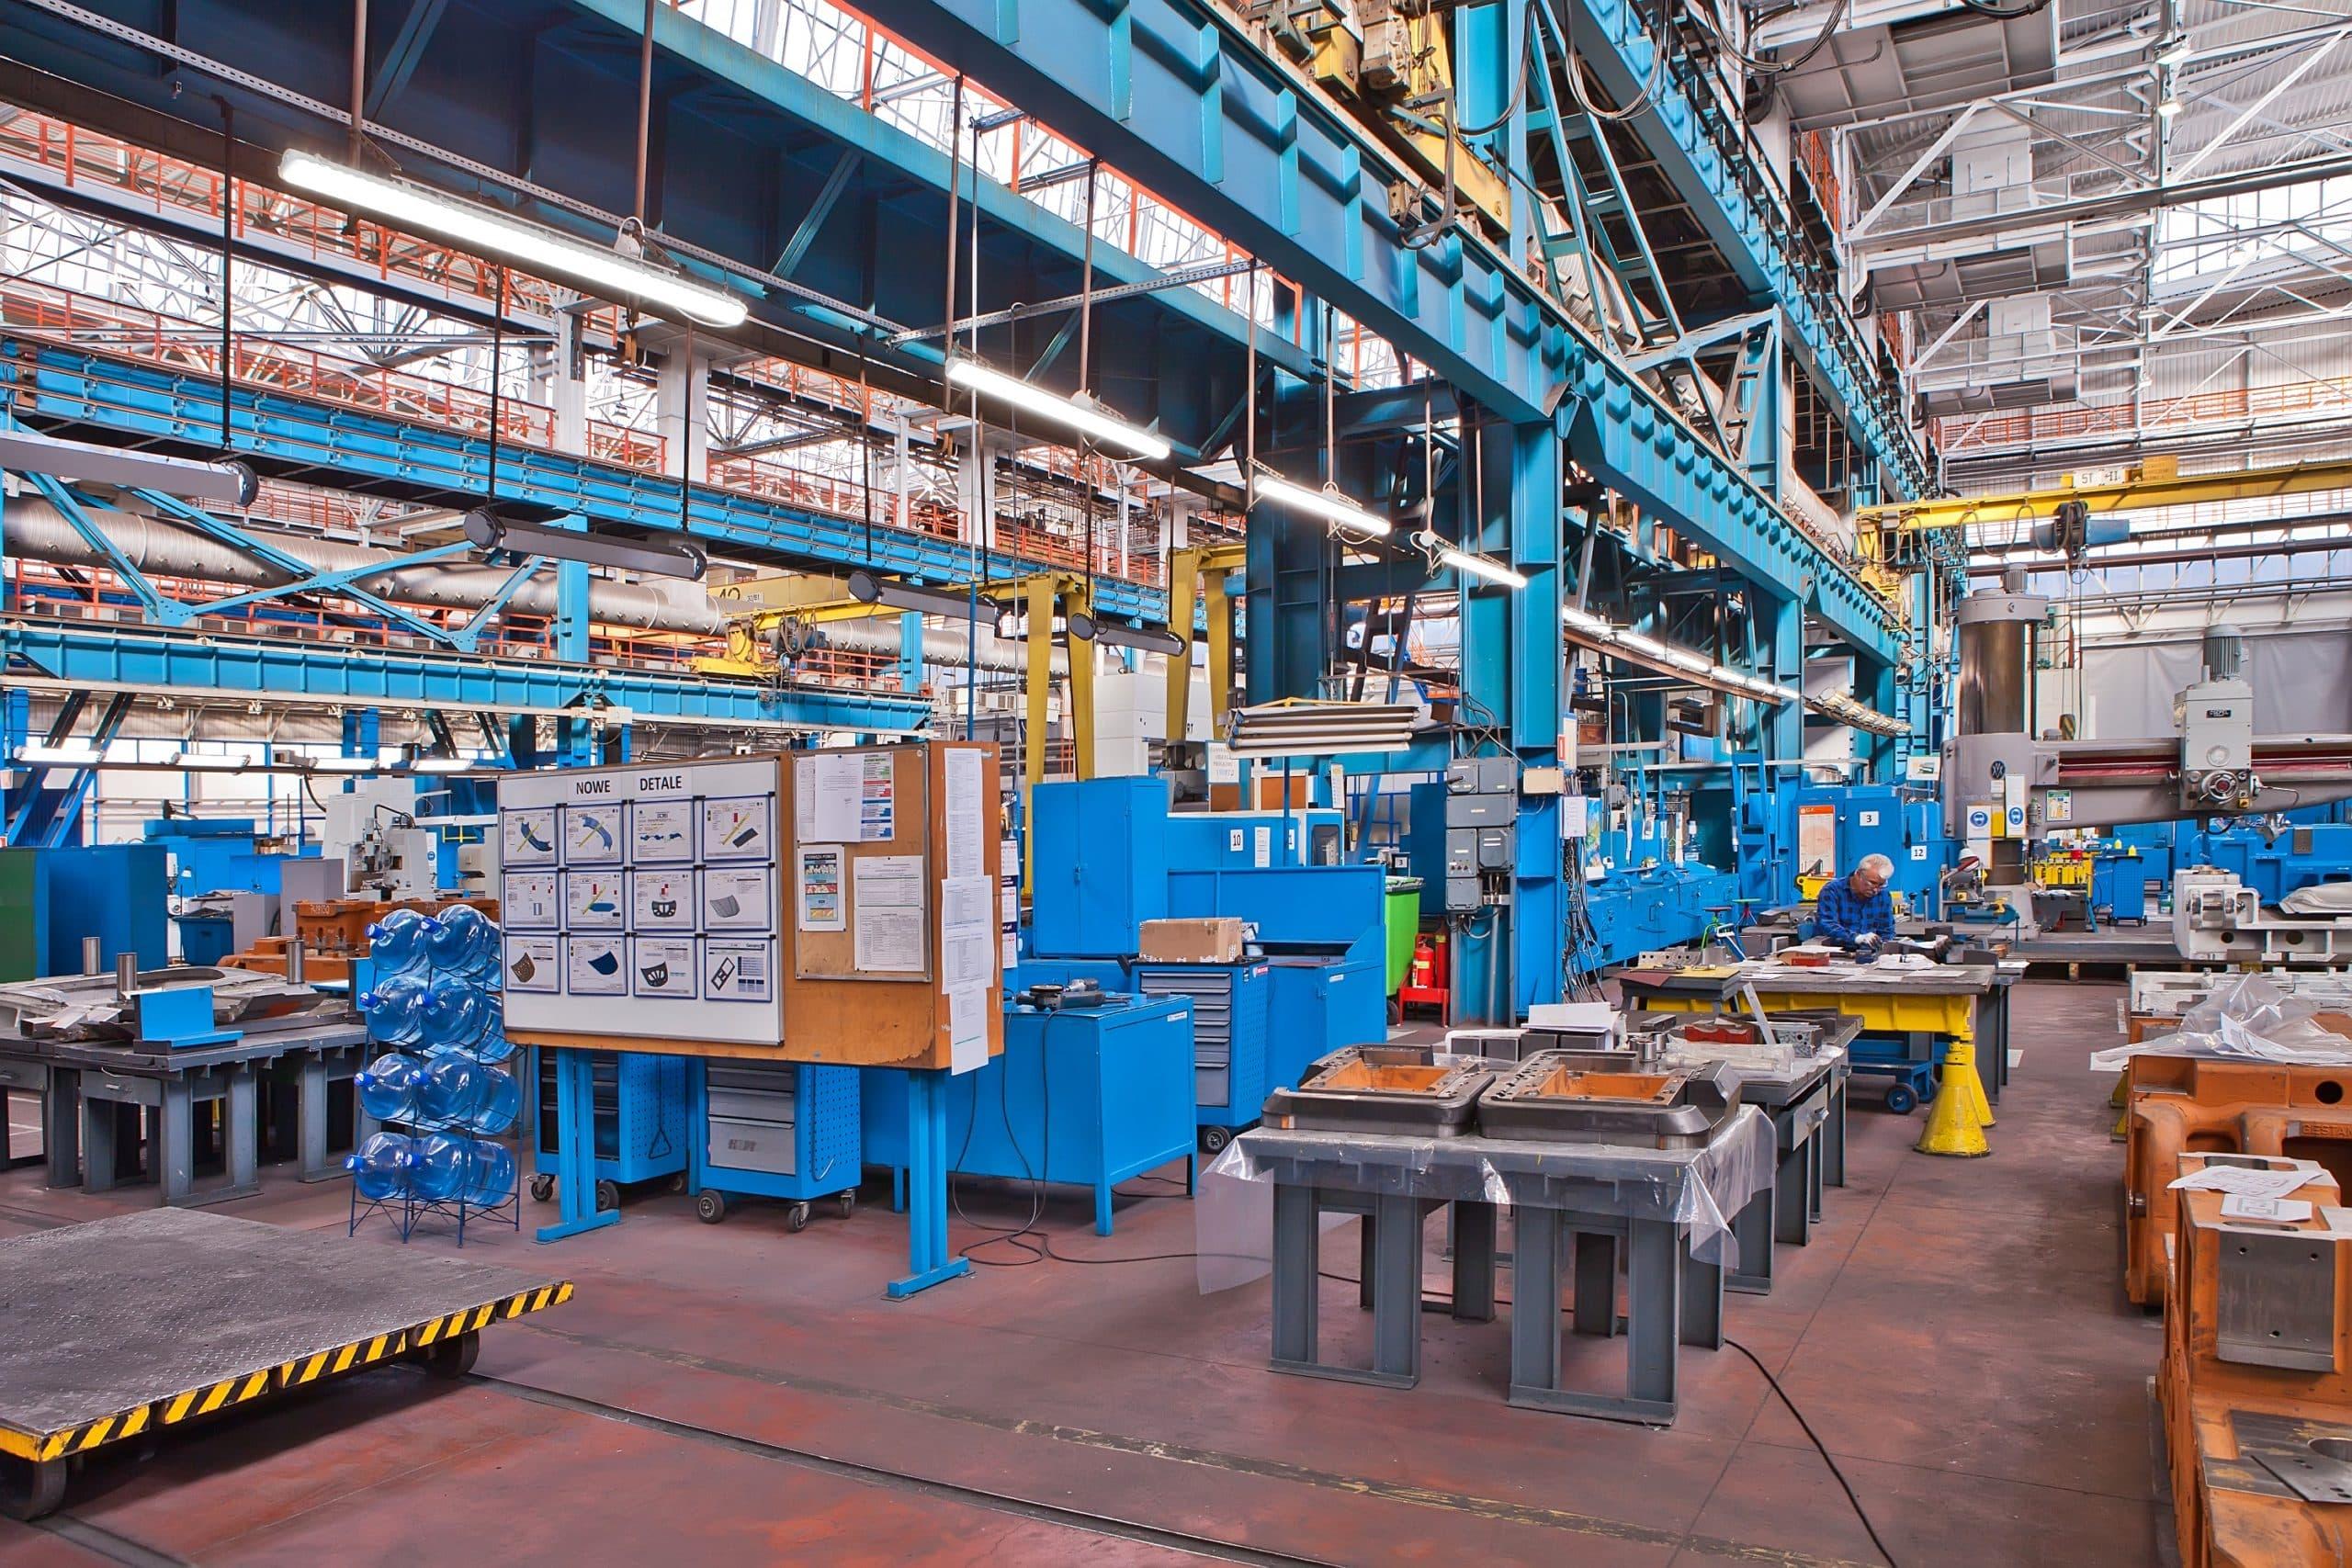 Oprawy Industrialna stanowiskach w firmie Fiat - Luxon LED